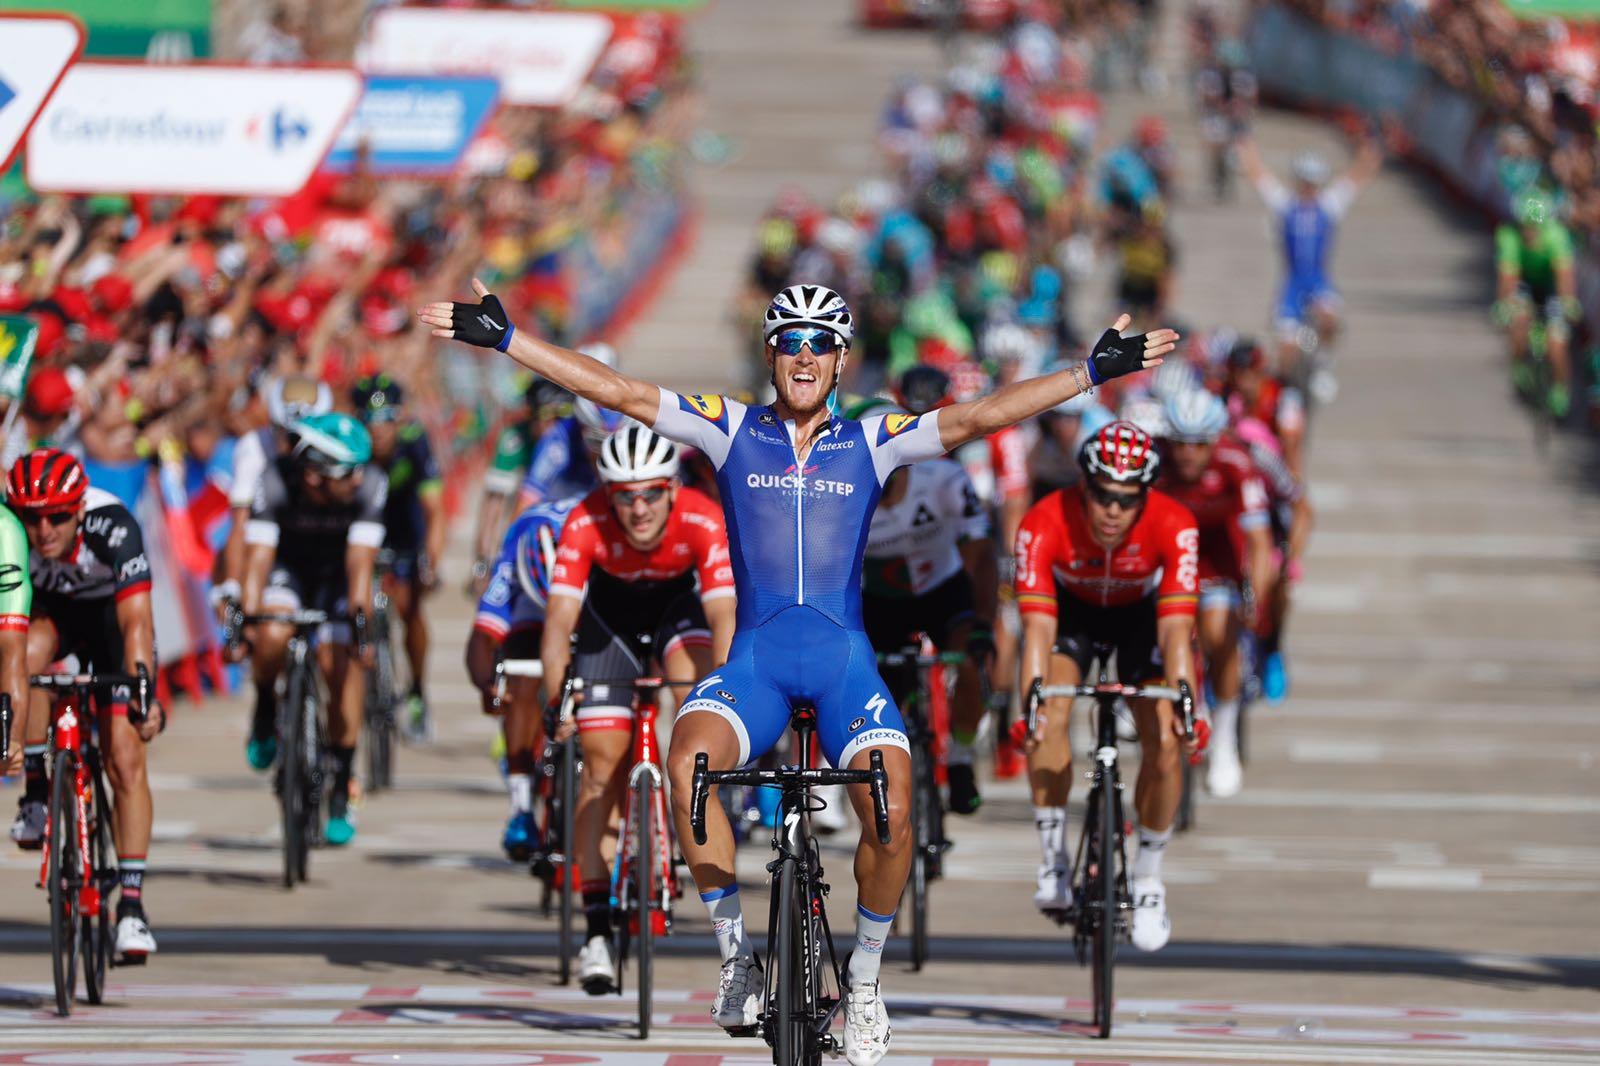 La Vuelta 2017, Trentin sfreccia a Tarragona